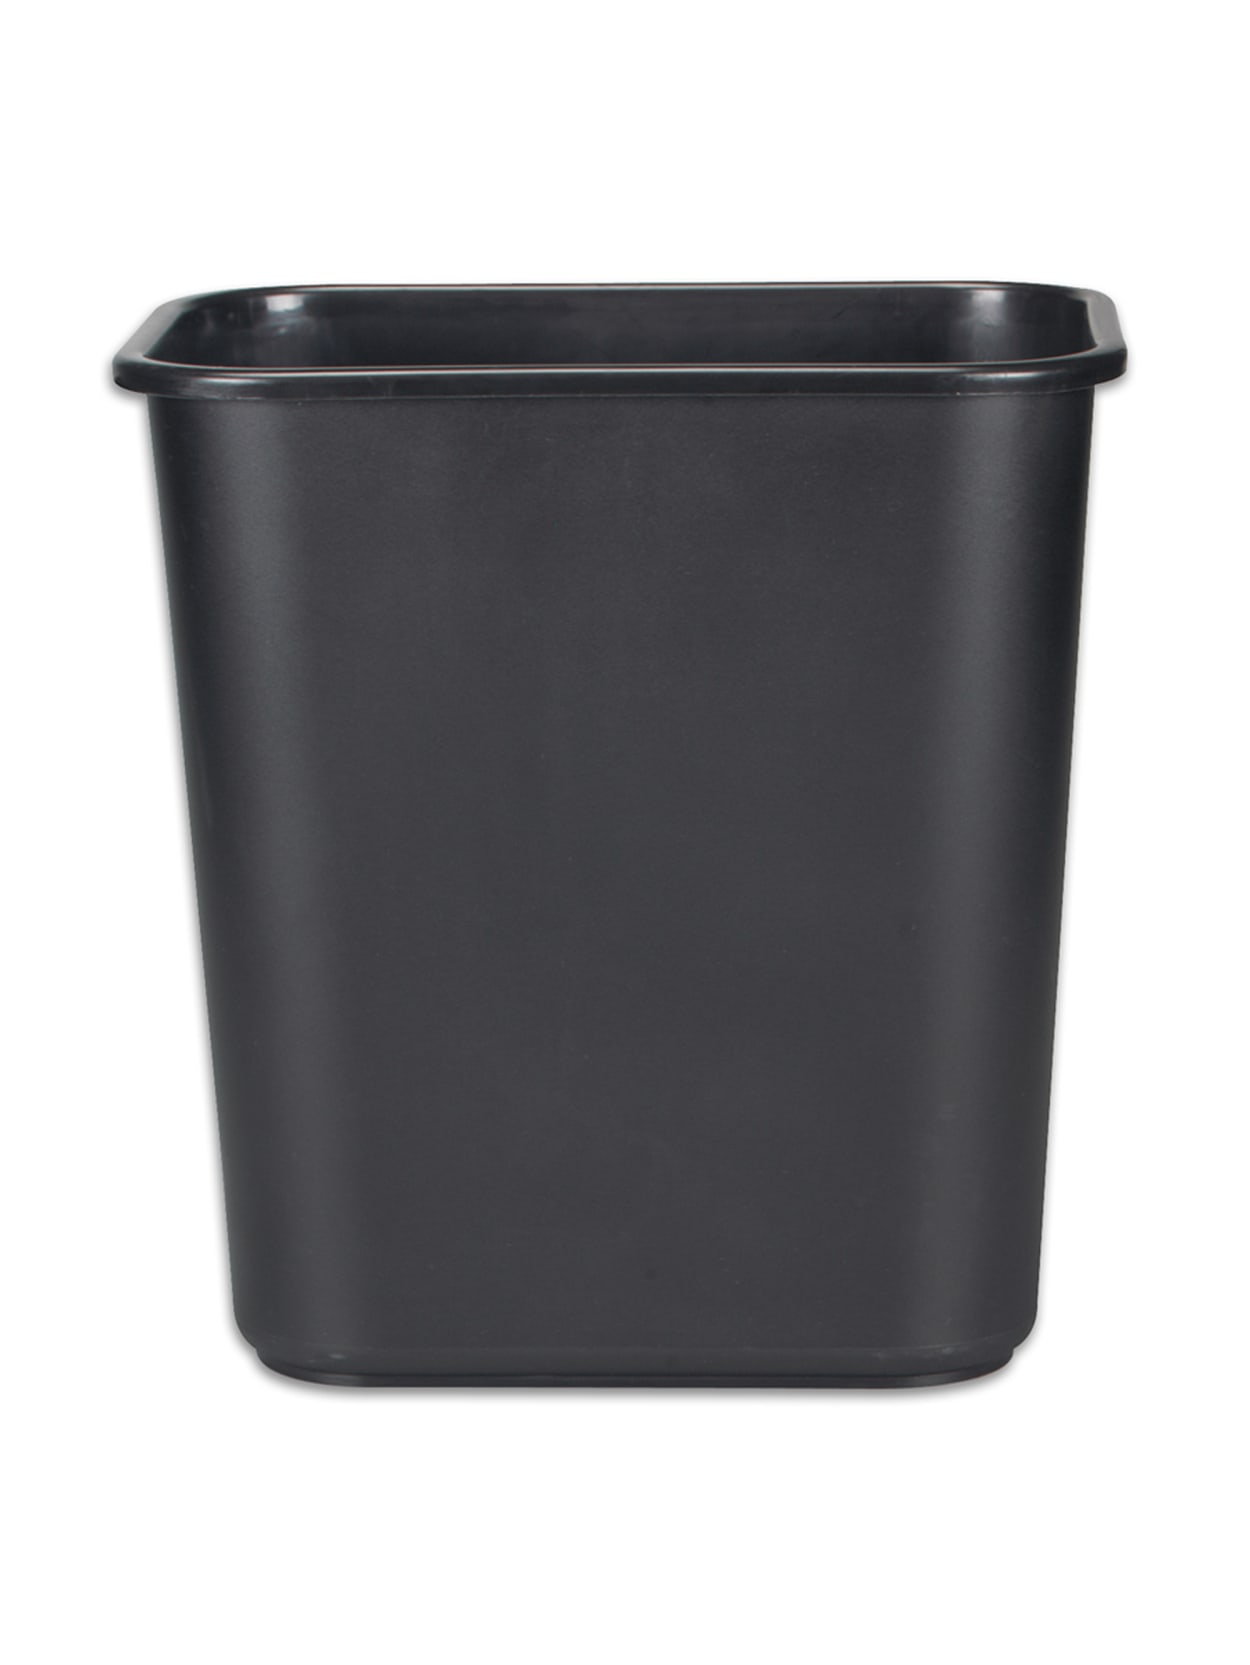 Rubbermaid Durable Polyethylene Wastebasket 7 Gallons Black Office Depot